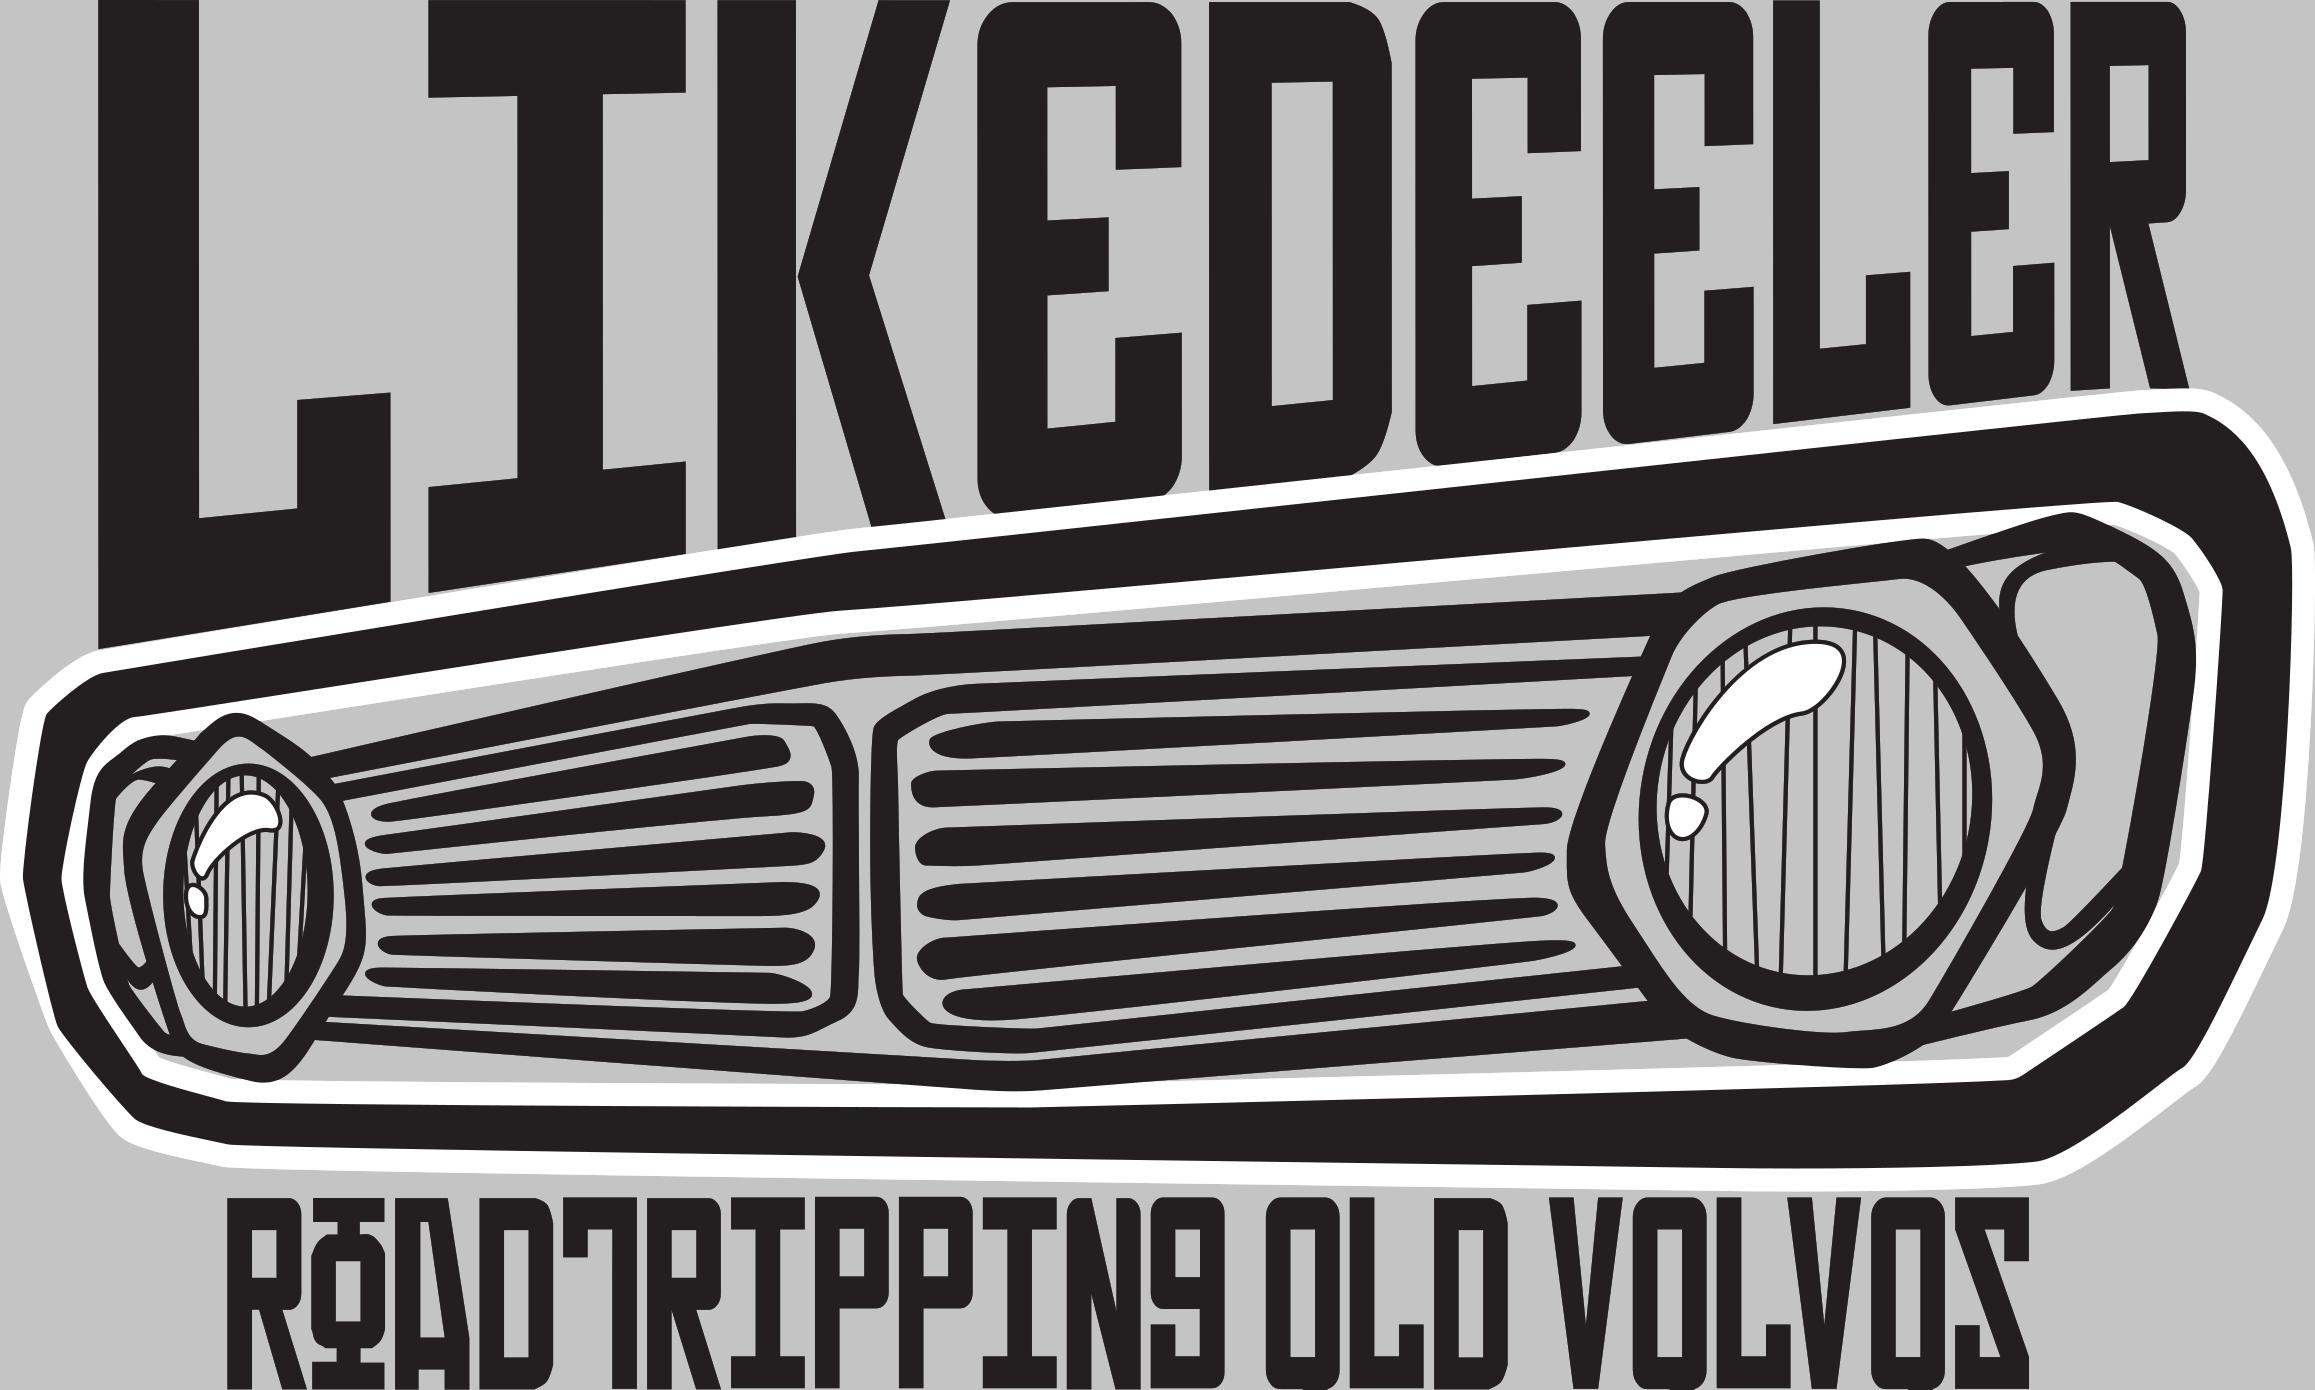 Likedeelerblog – roadtripping old volvos